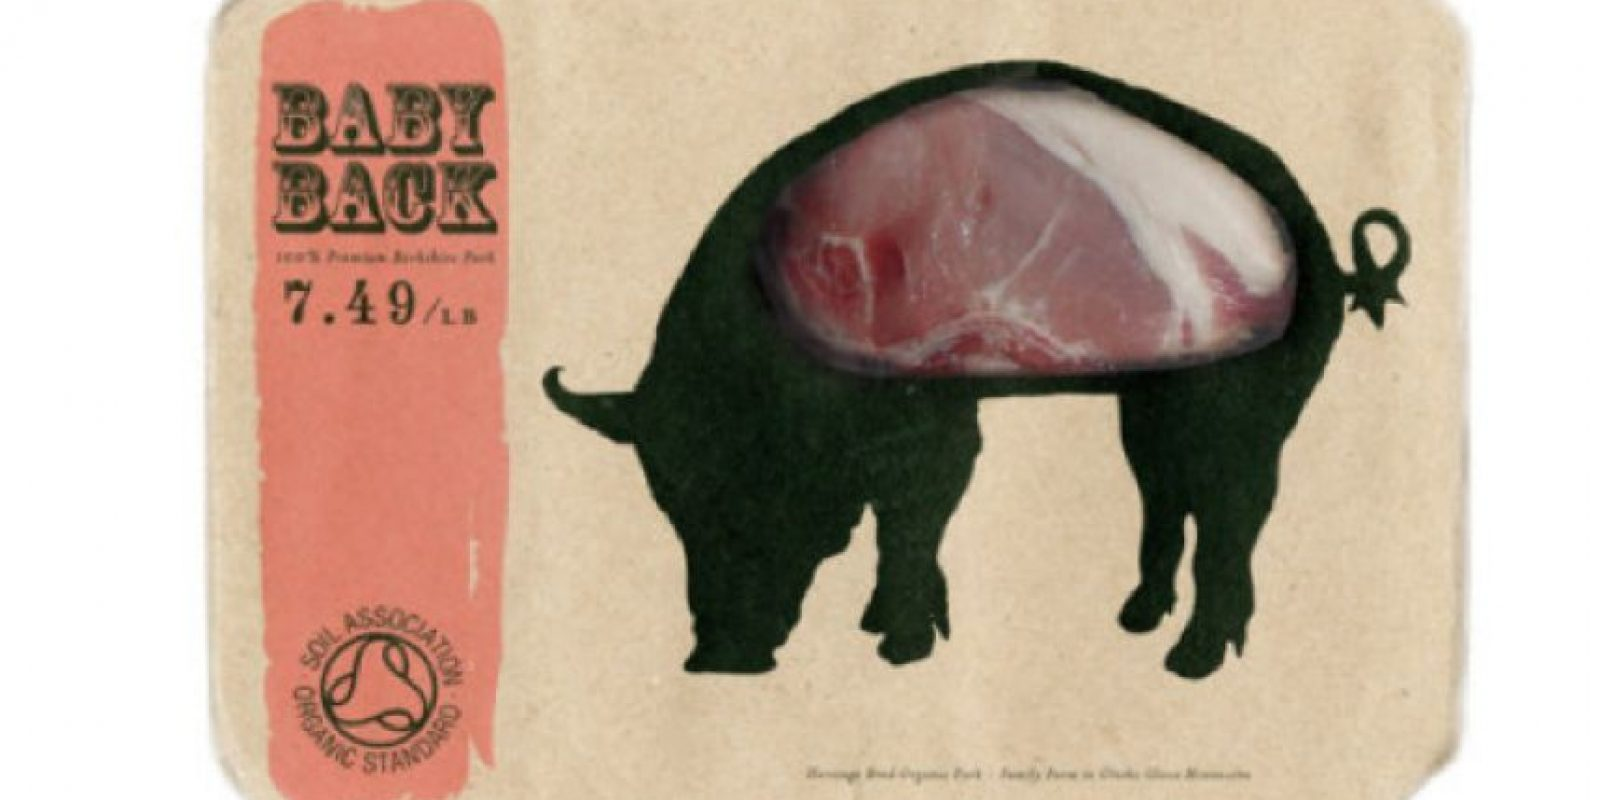 ¿Carne de cerdo? así se ve mejor